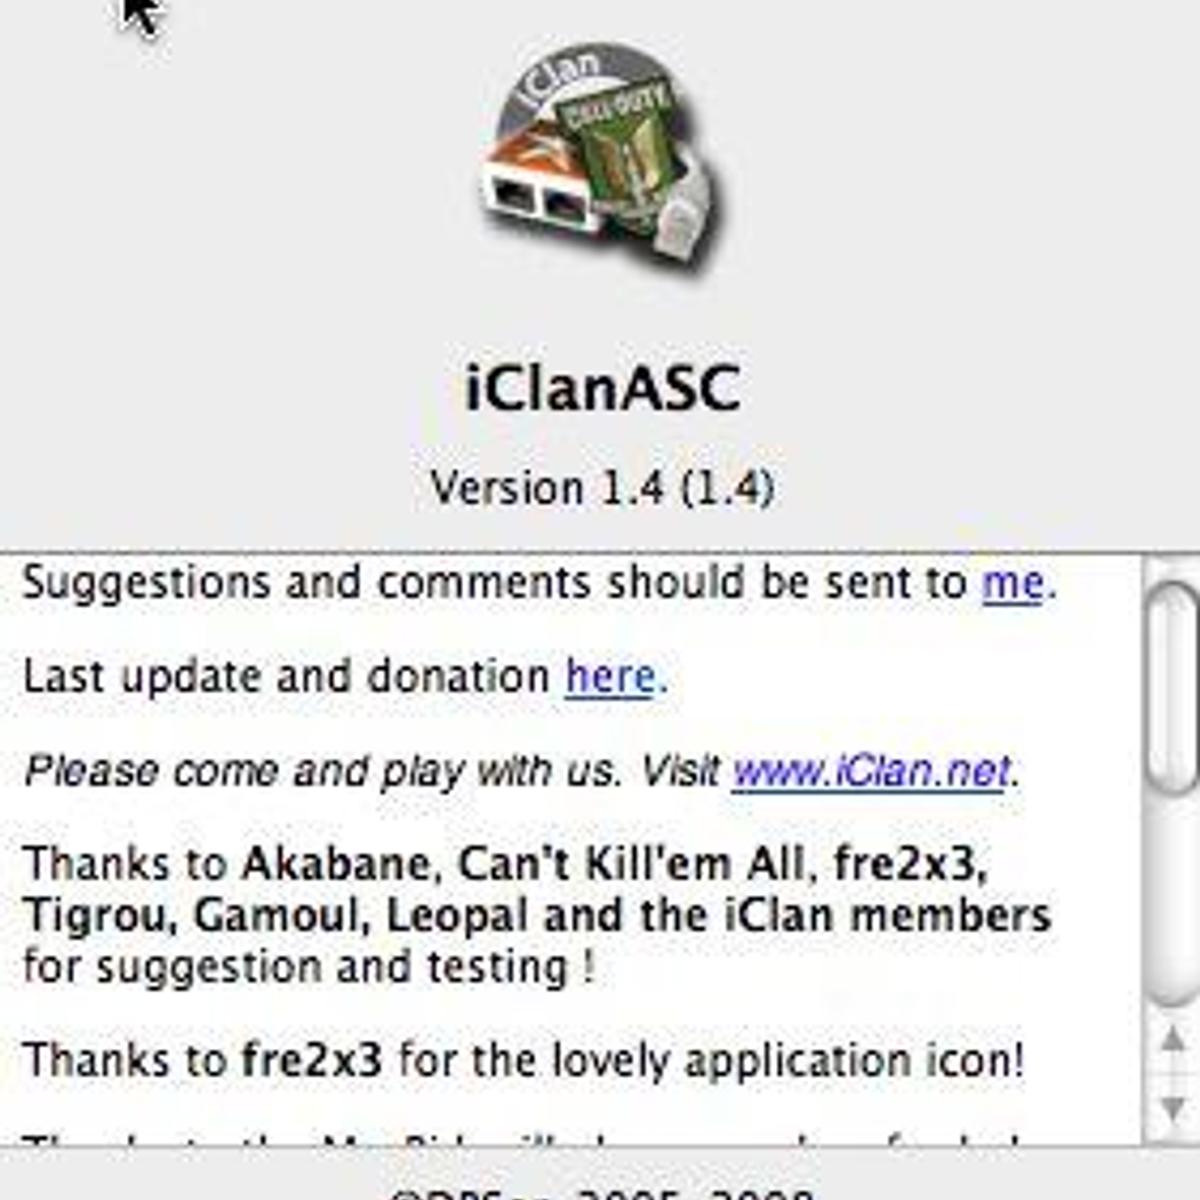 iClanASC Alternatives and Similar Games - AlternativeTo net